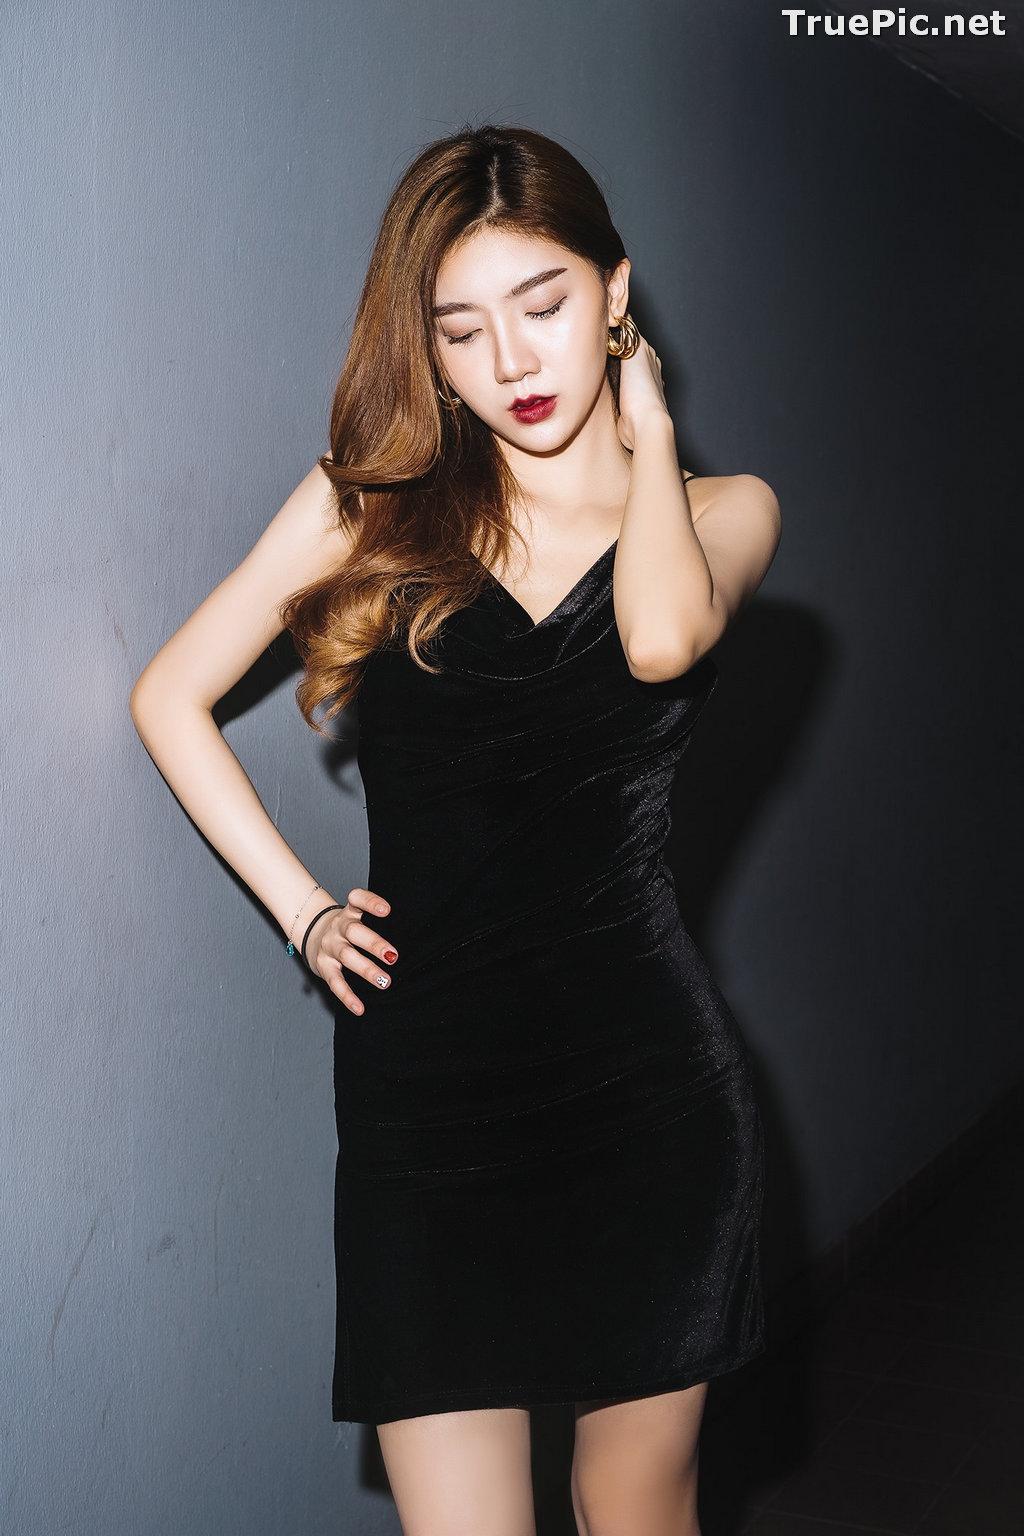 Image Thailand Model - Sasi Ngiunwan - Black For SiamNight - TruePic.net - Picture-36